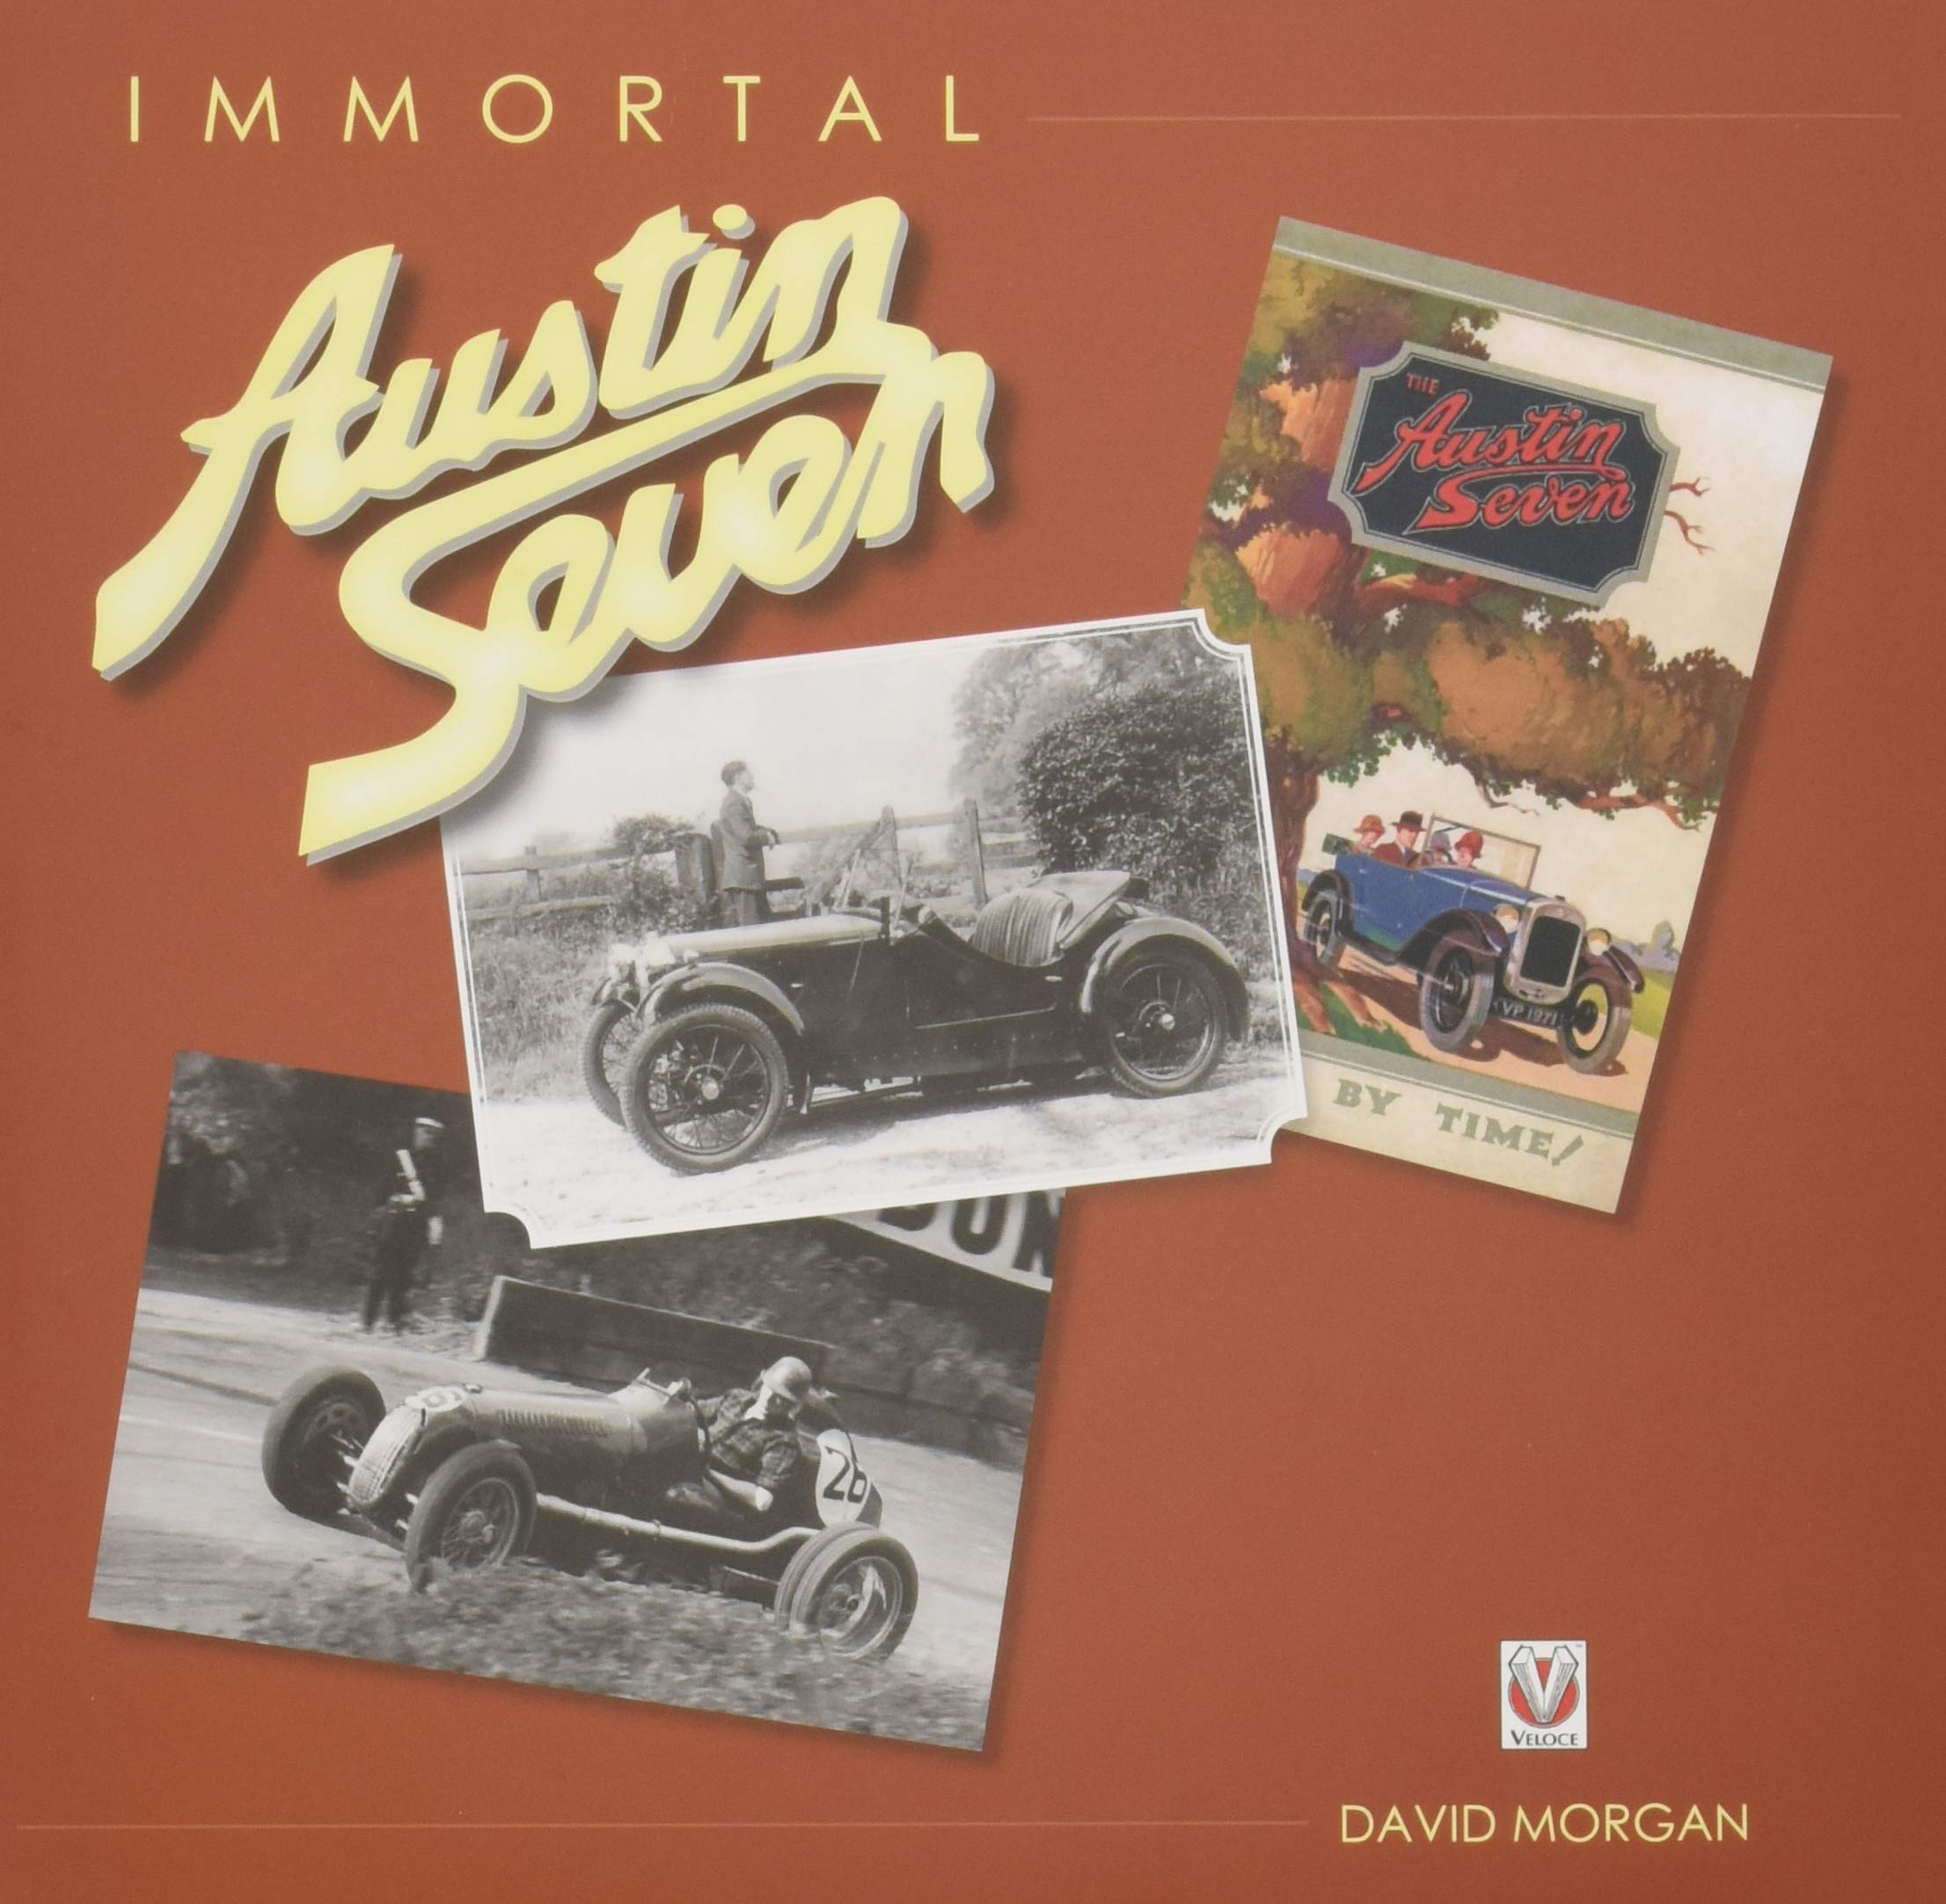 Read Online Immortal Austin Seven pdf